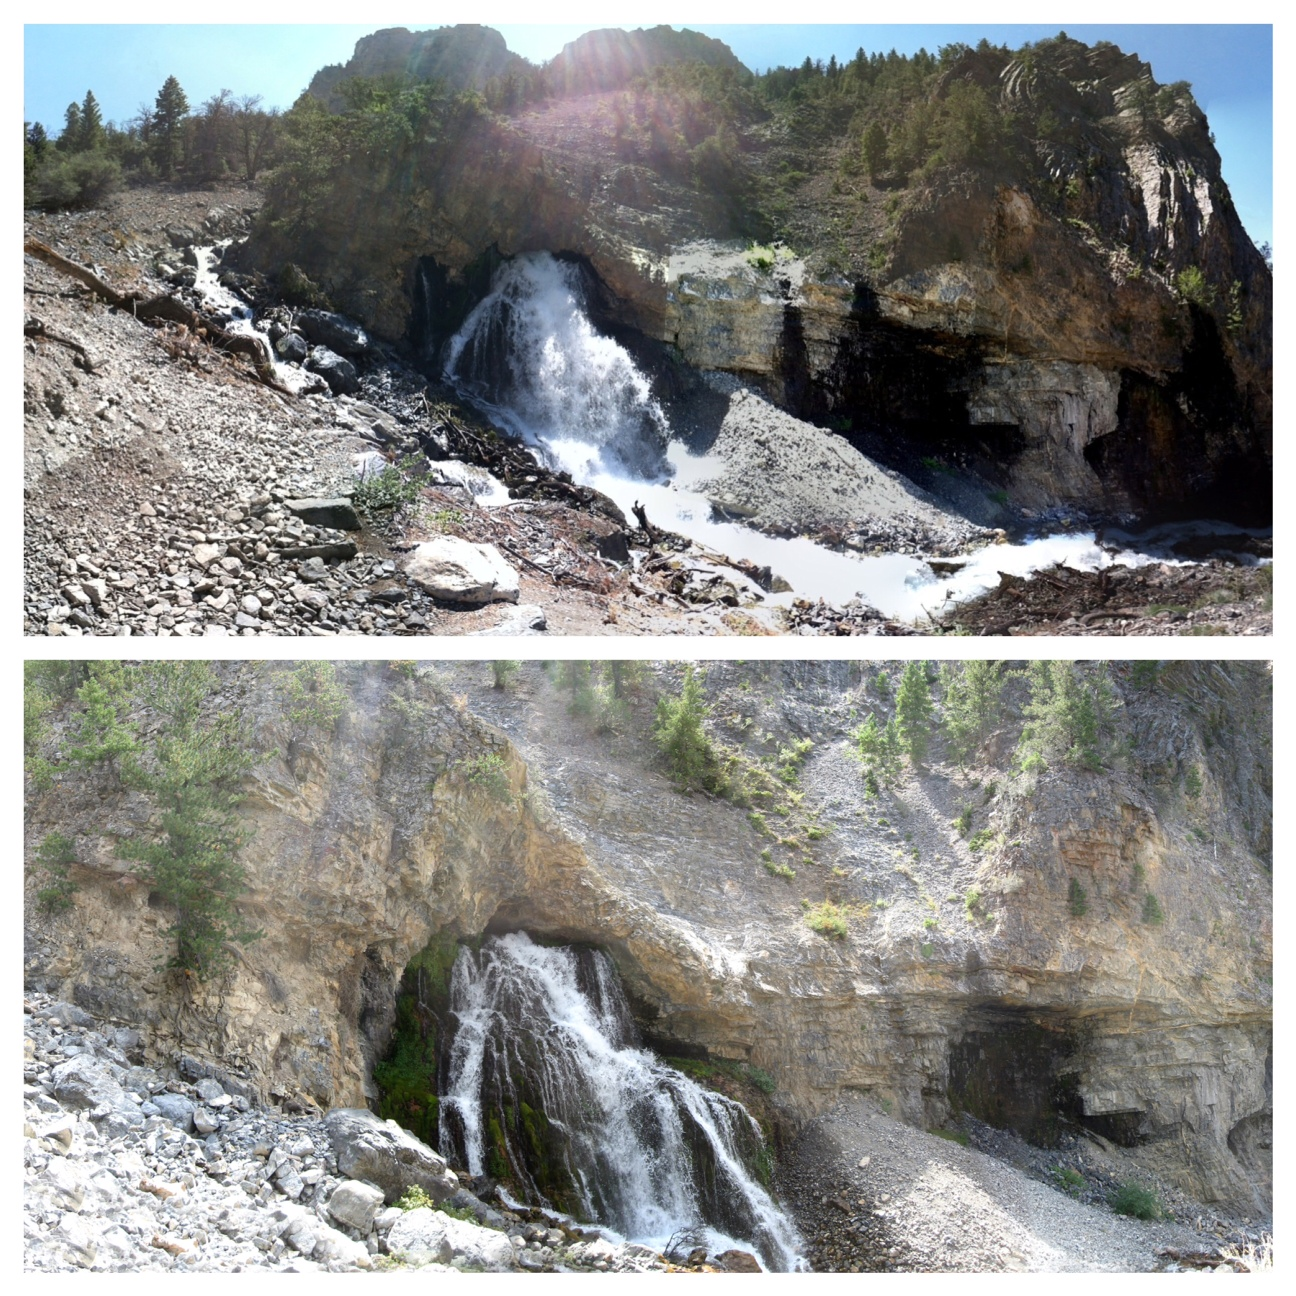 Mackay Idaho 83251 Lower Cedar Creek Above Mackay Idaho